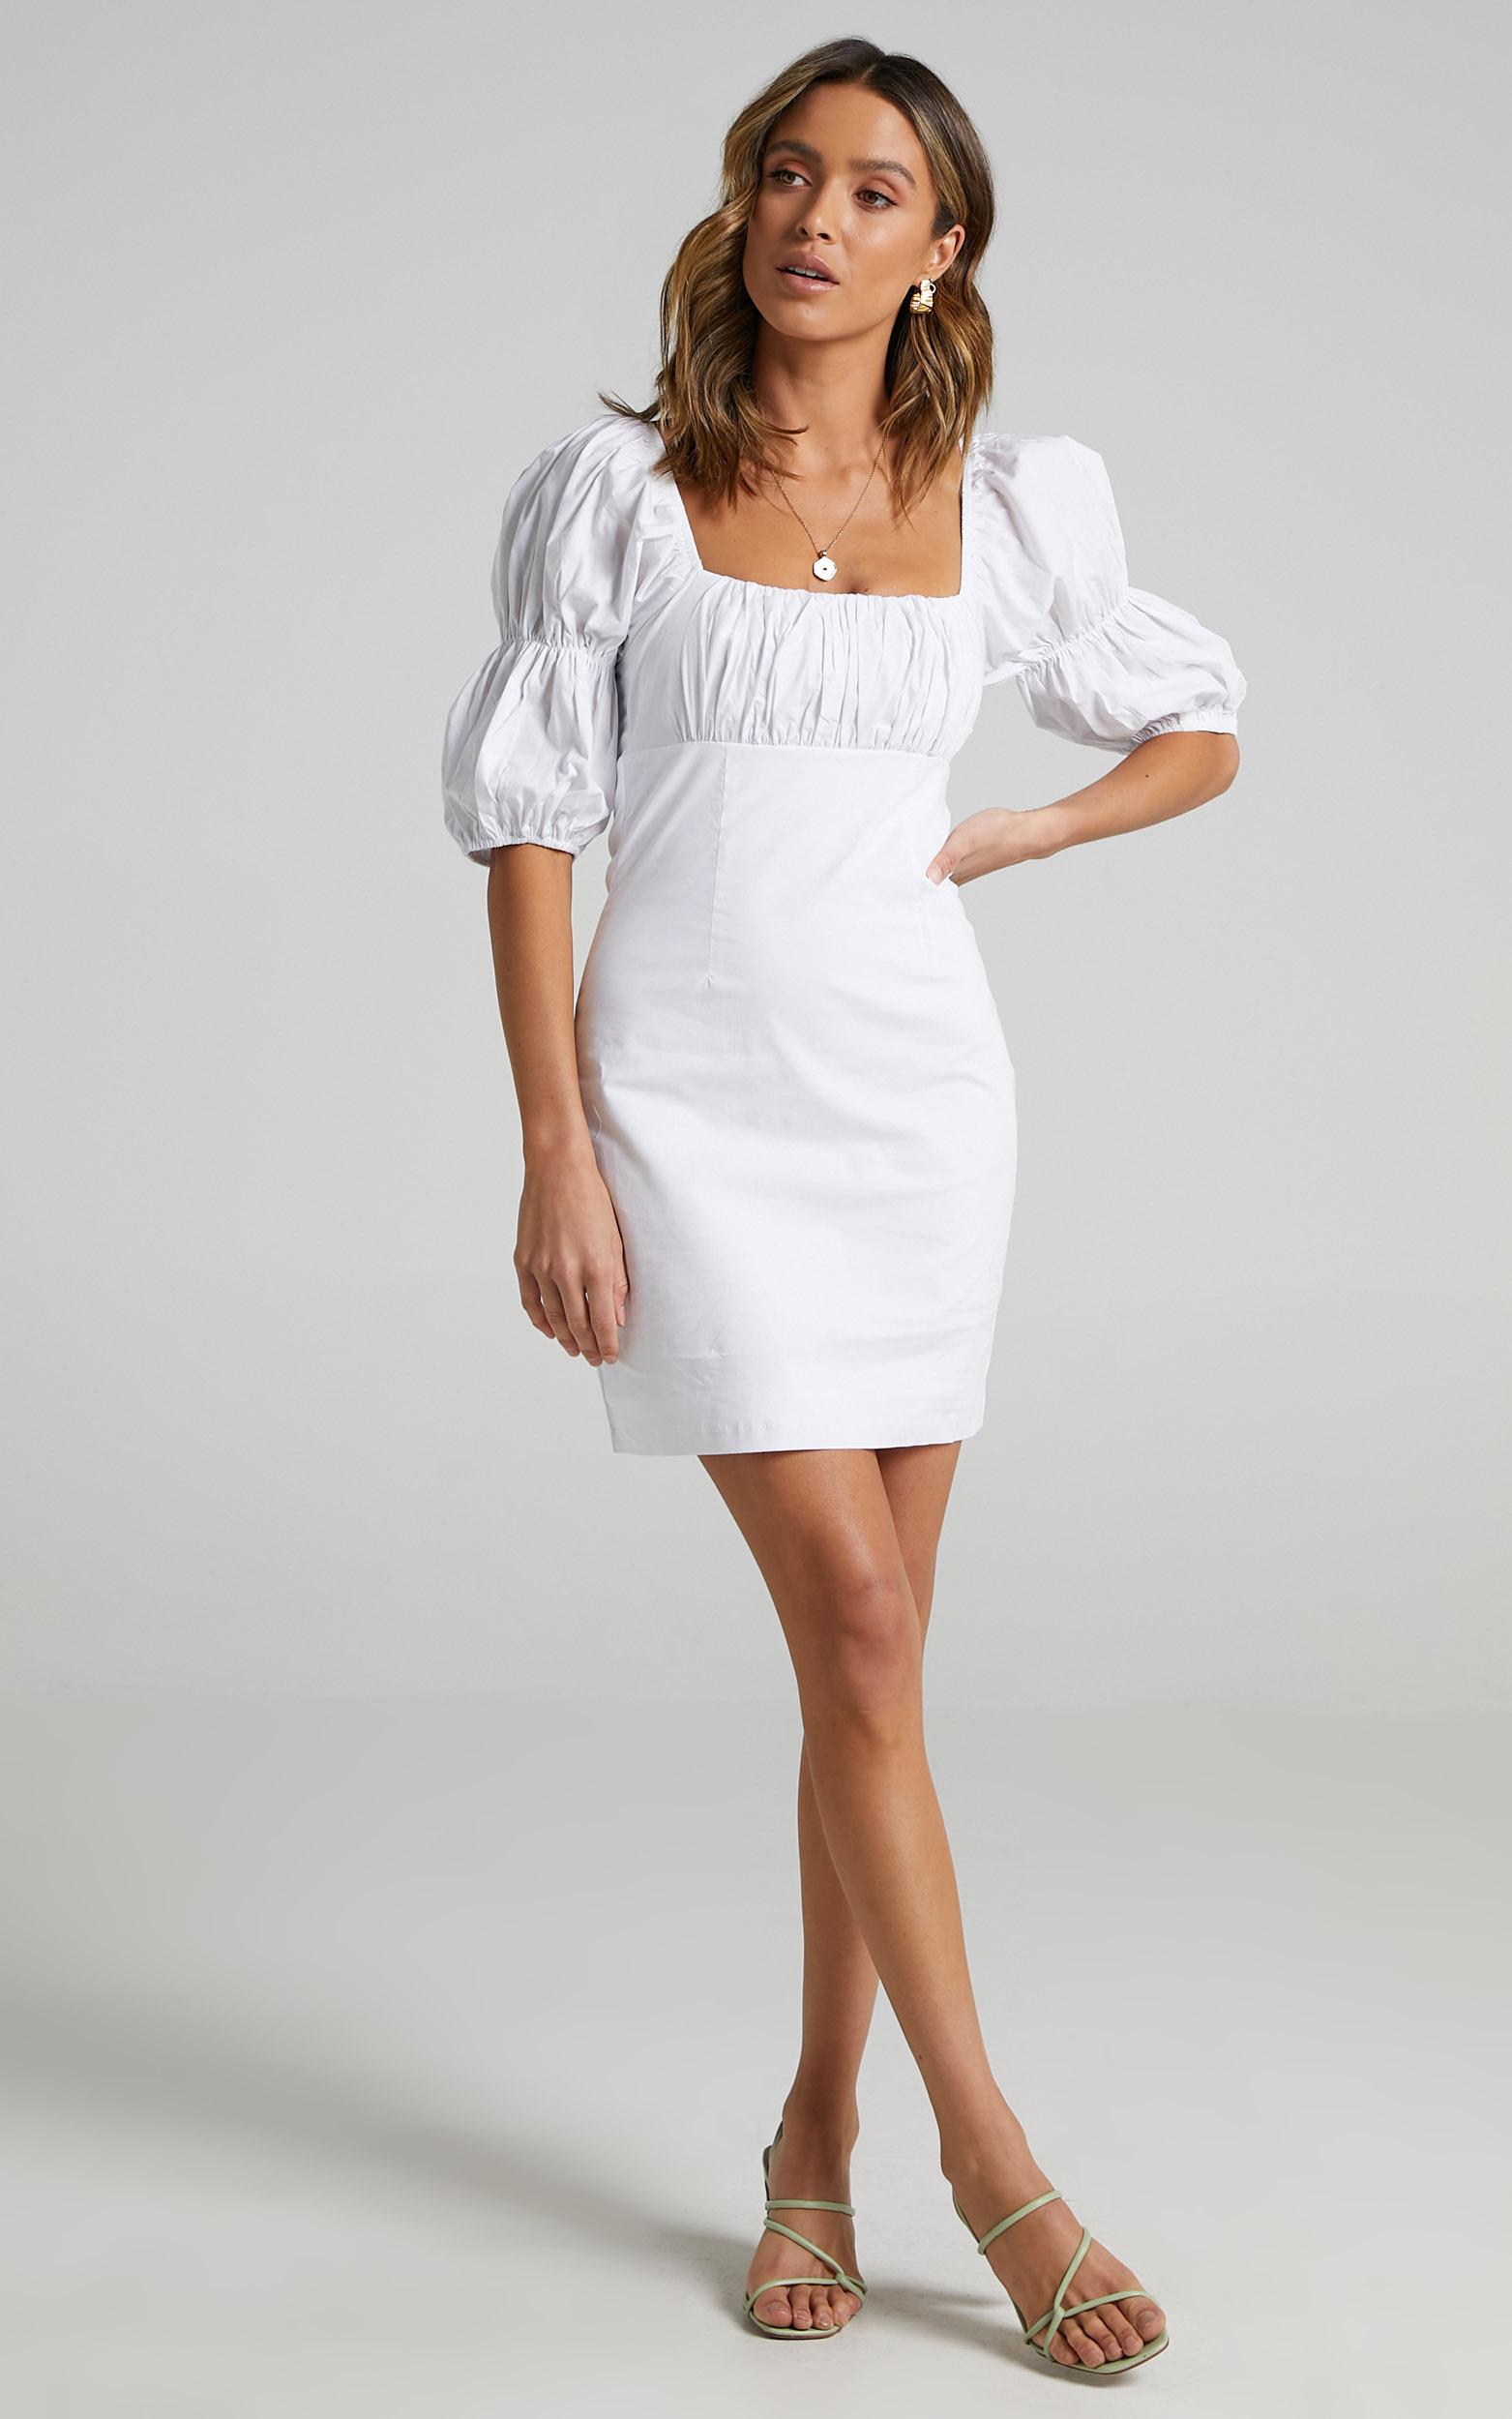 Adalira Dress in White - 06, WHT1, hi-res image number null